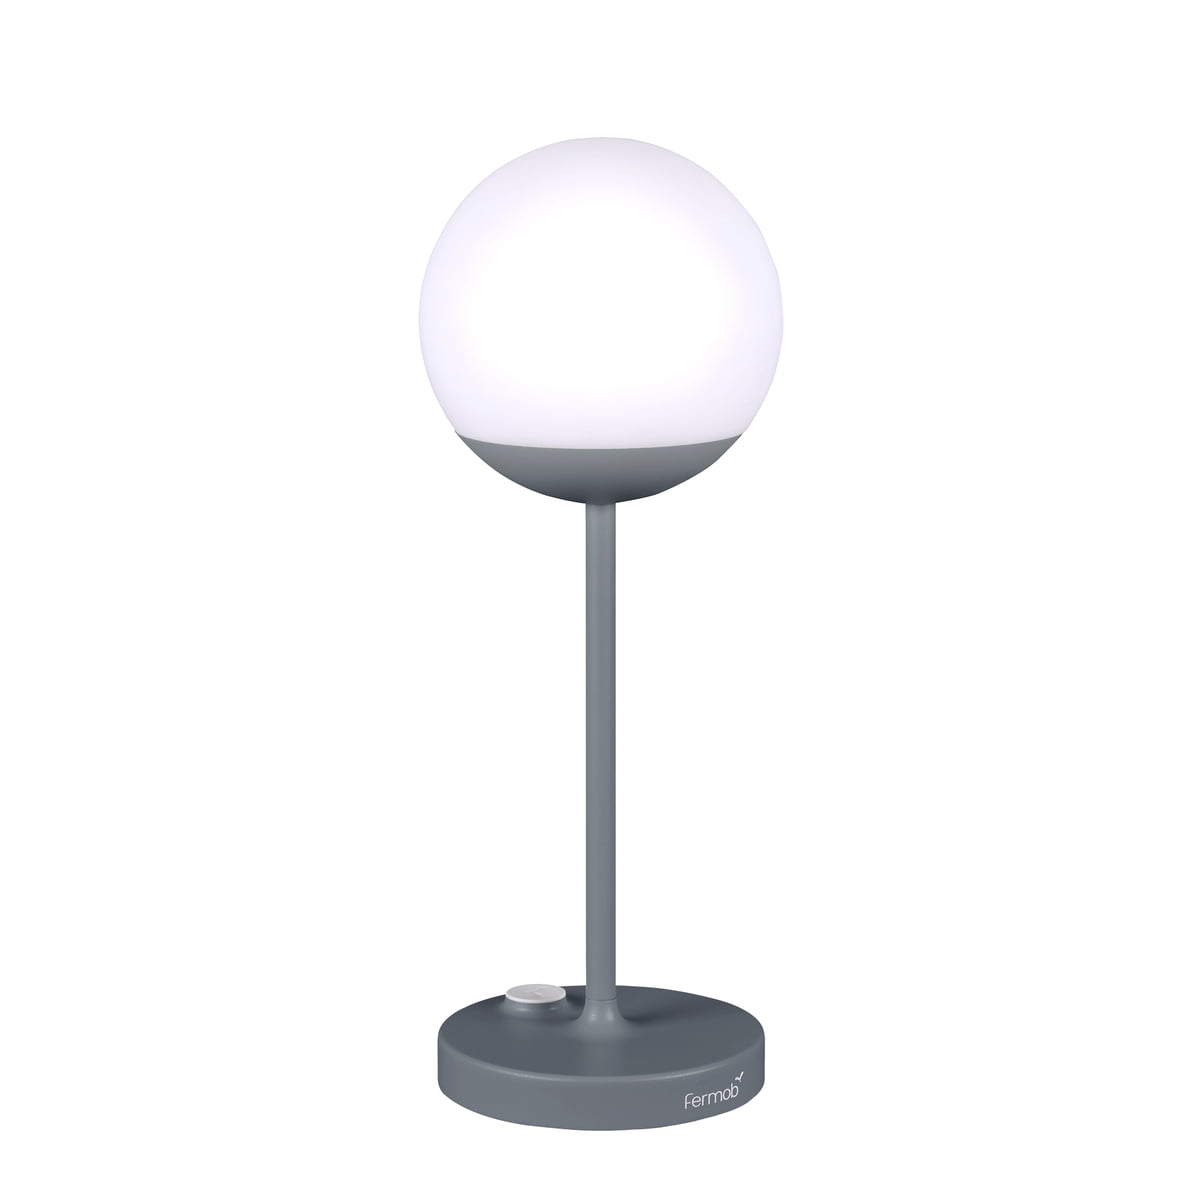 Fermob - Mooon! Akku LED-Leuchte, H 9 cm, capucine